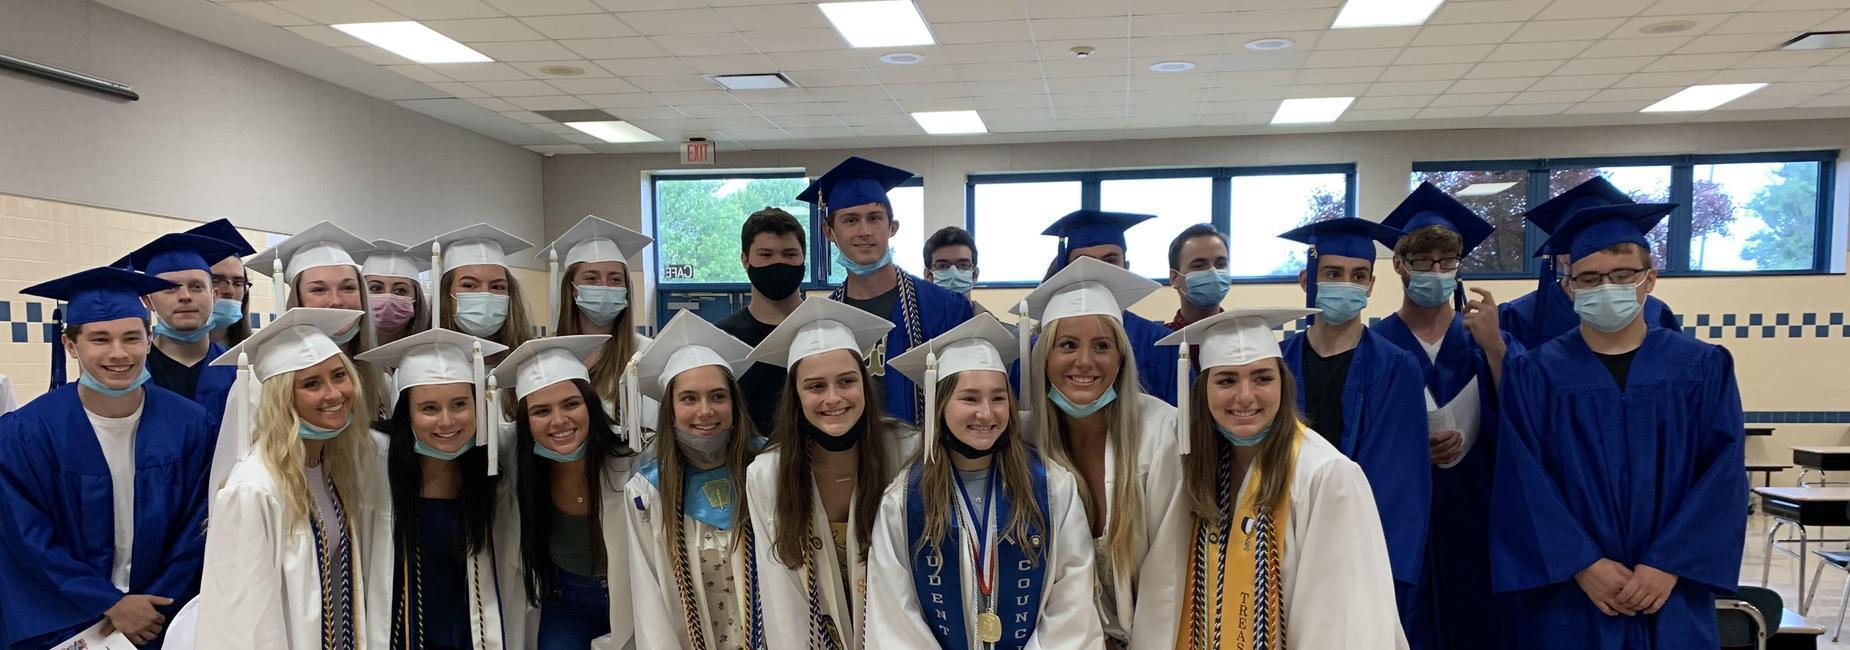 kids in graduation robes